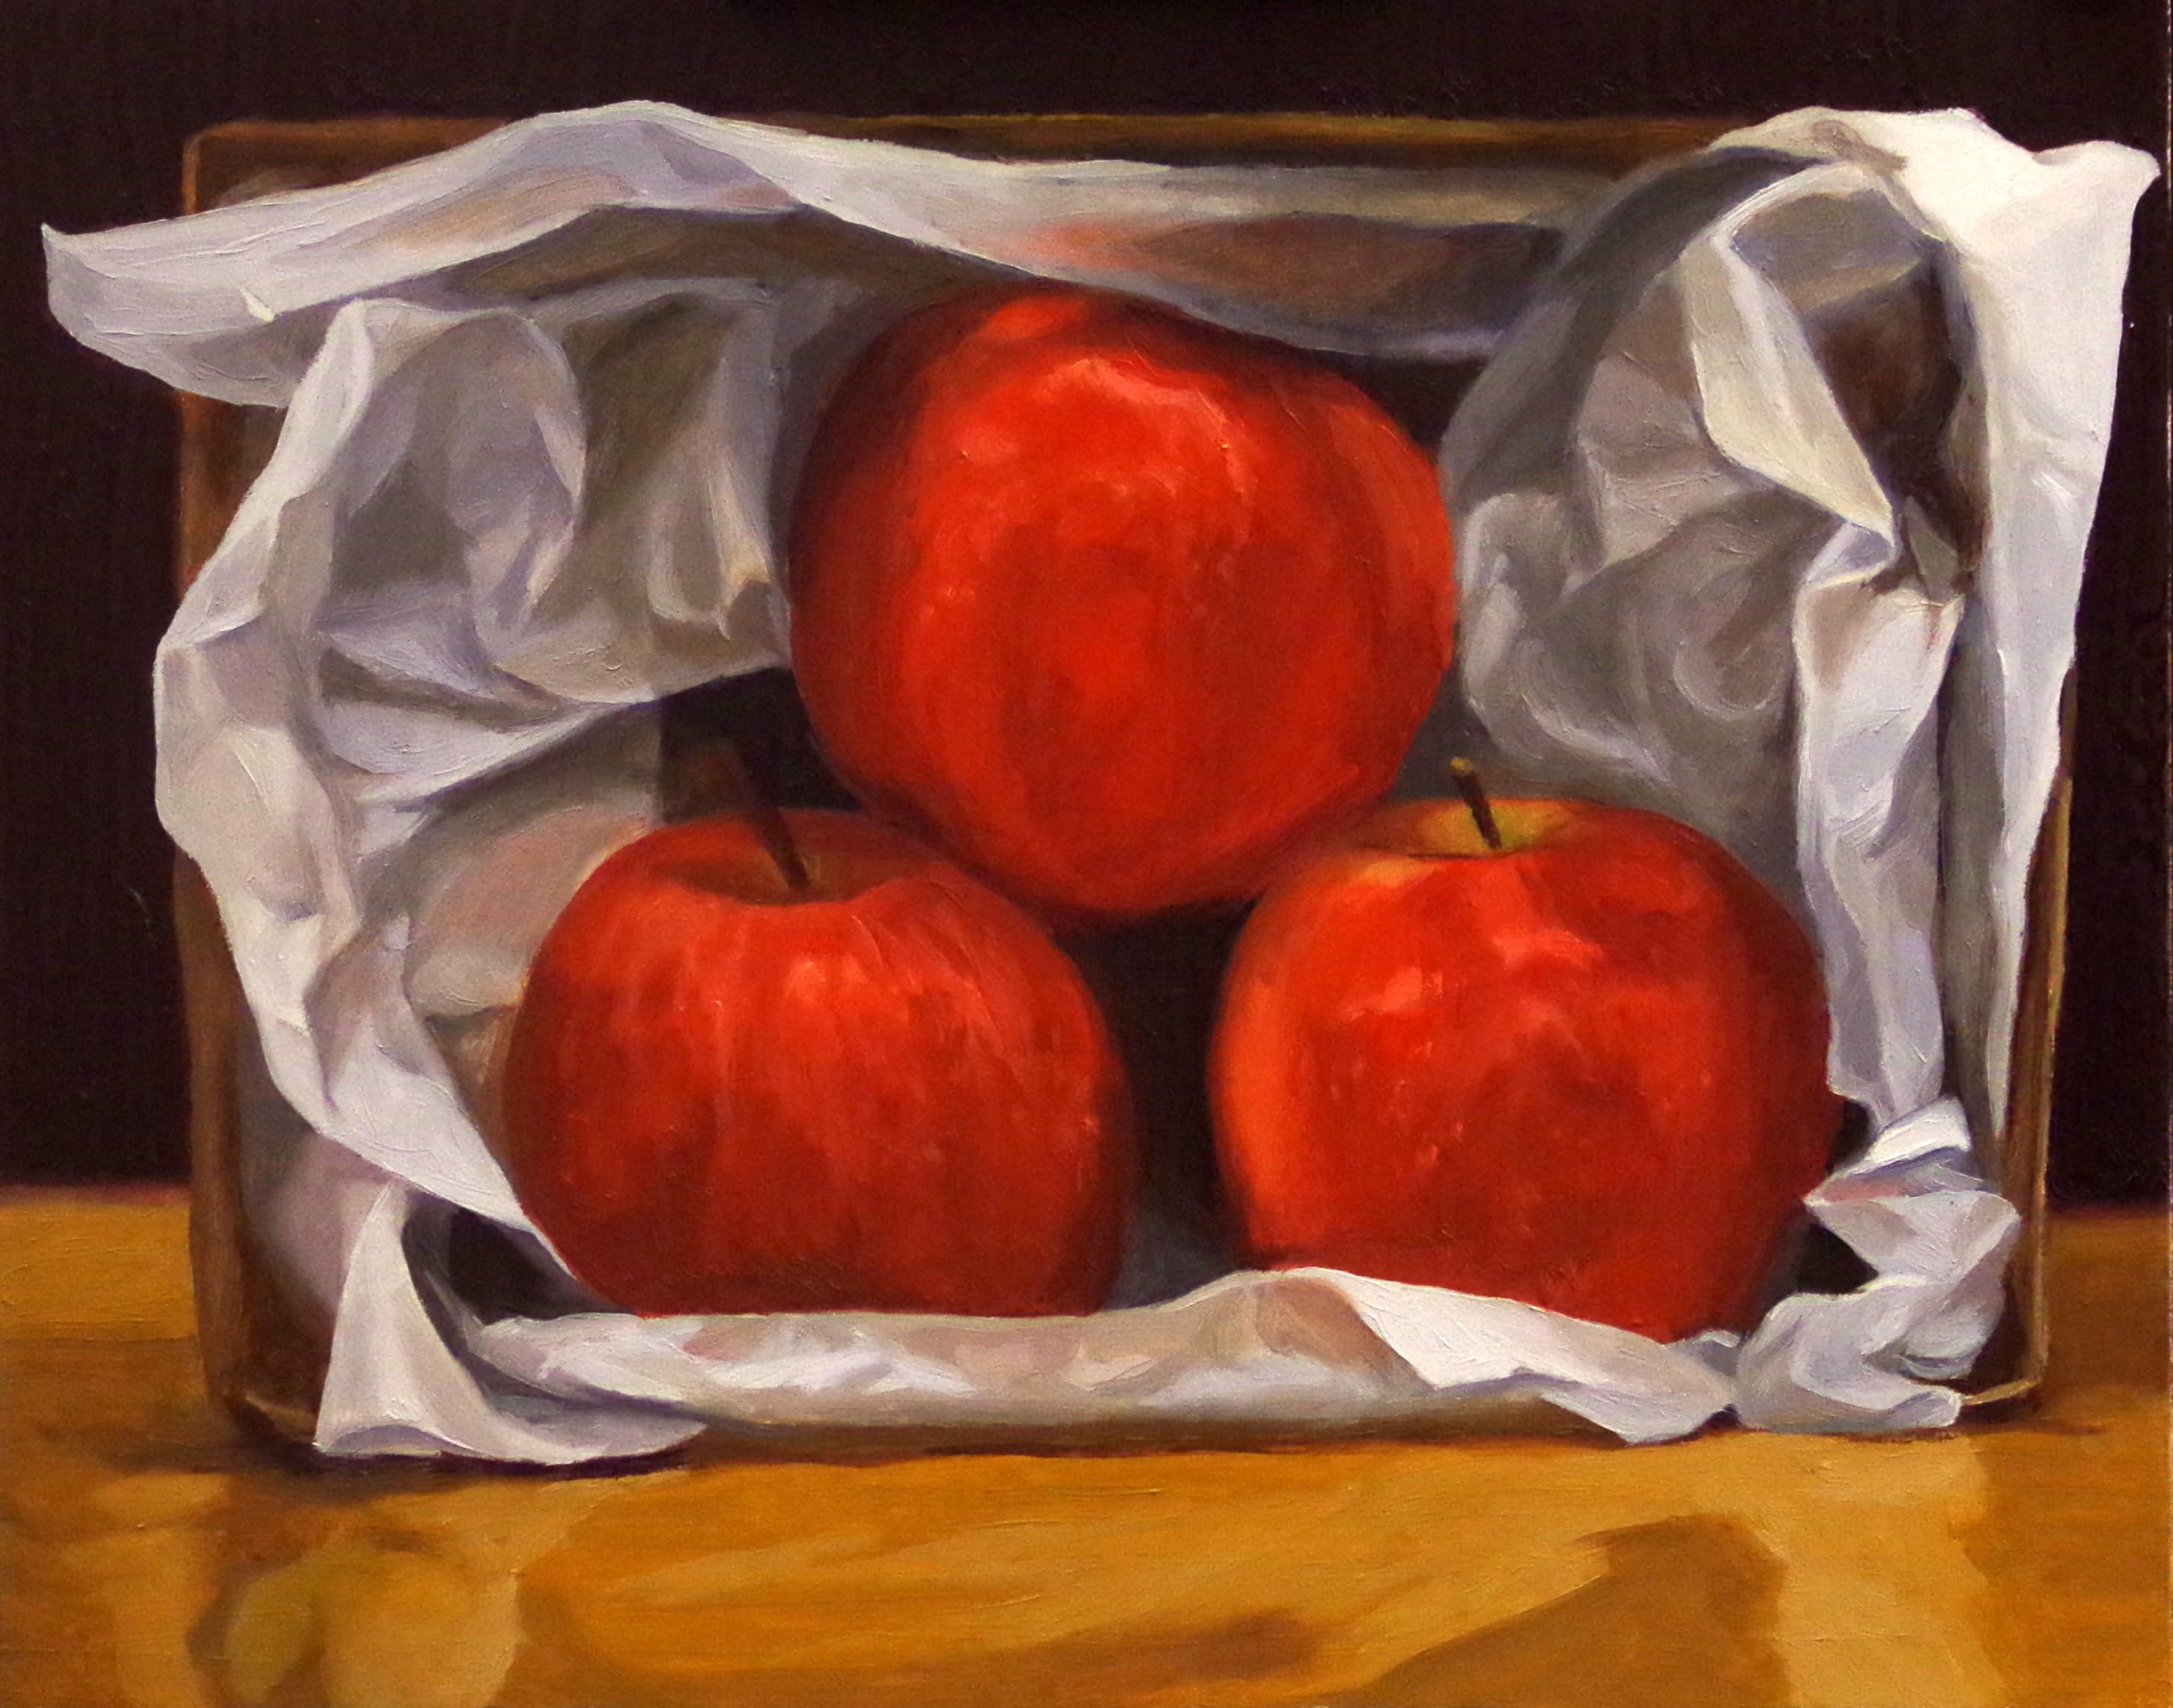 Apples in a cardboard box h8zjiw